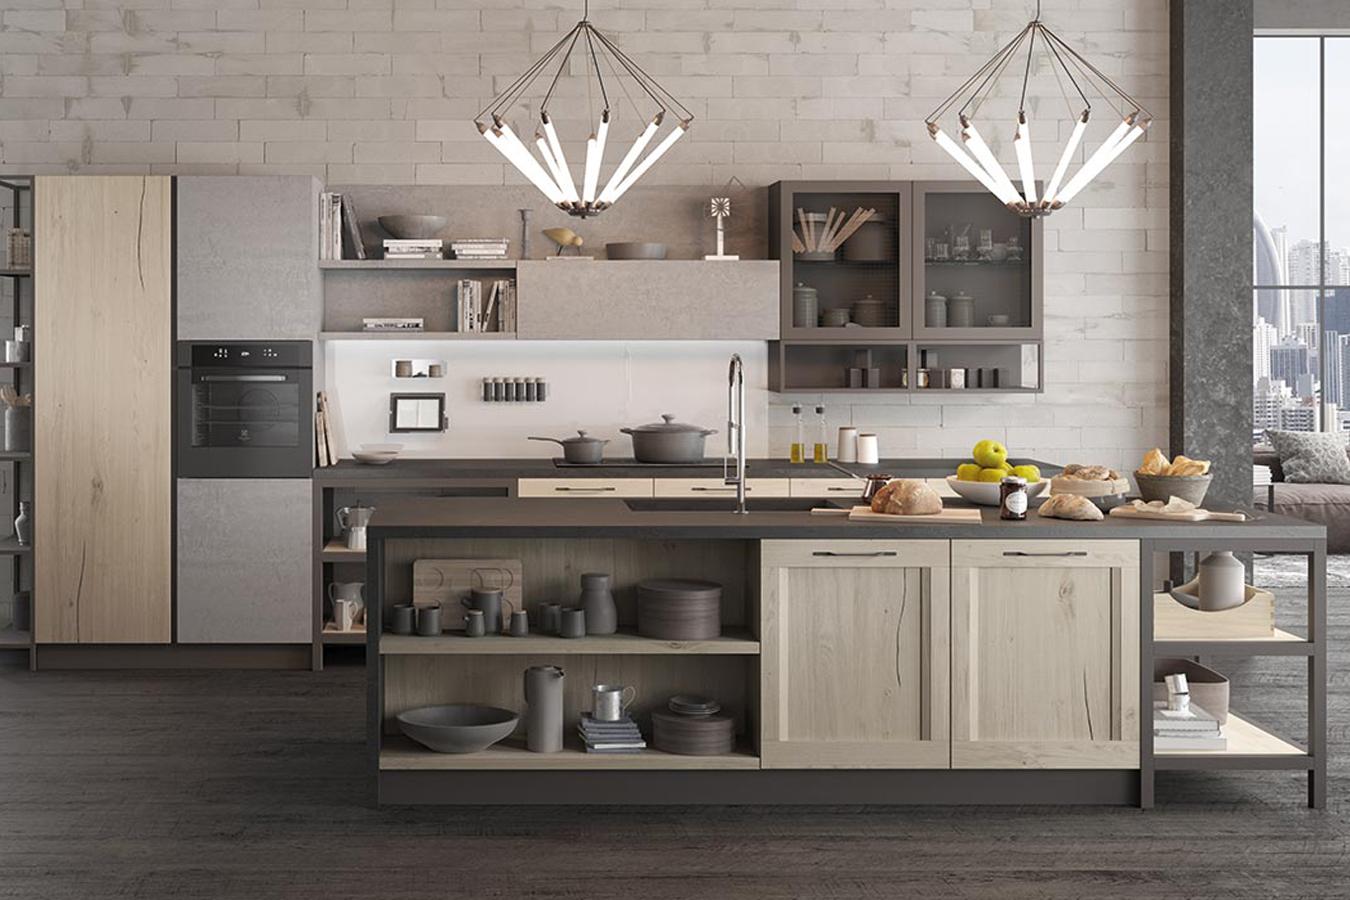 Cucina asia factory di arredo3 righetti mobili novara for Cucina arreda